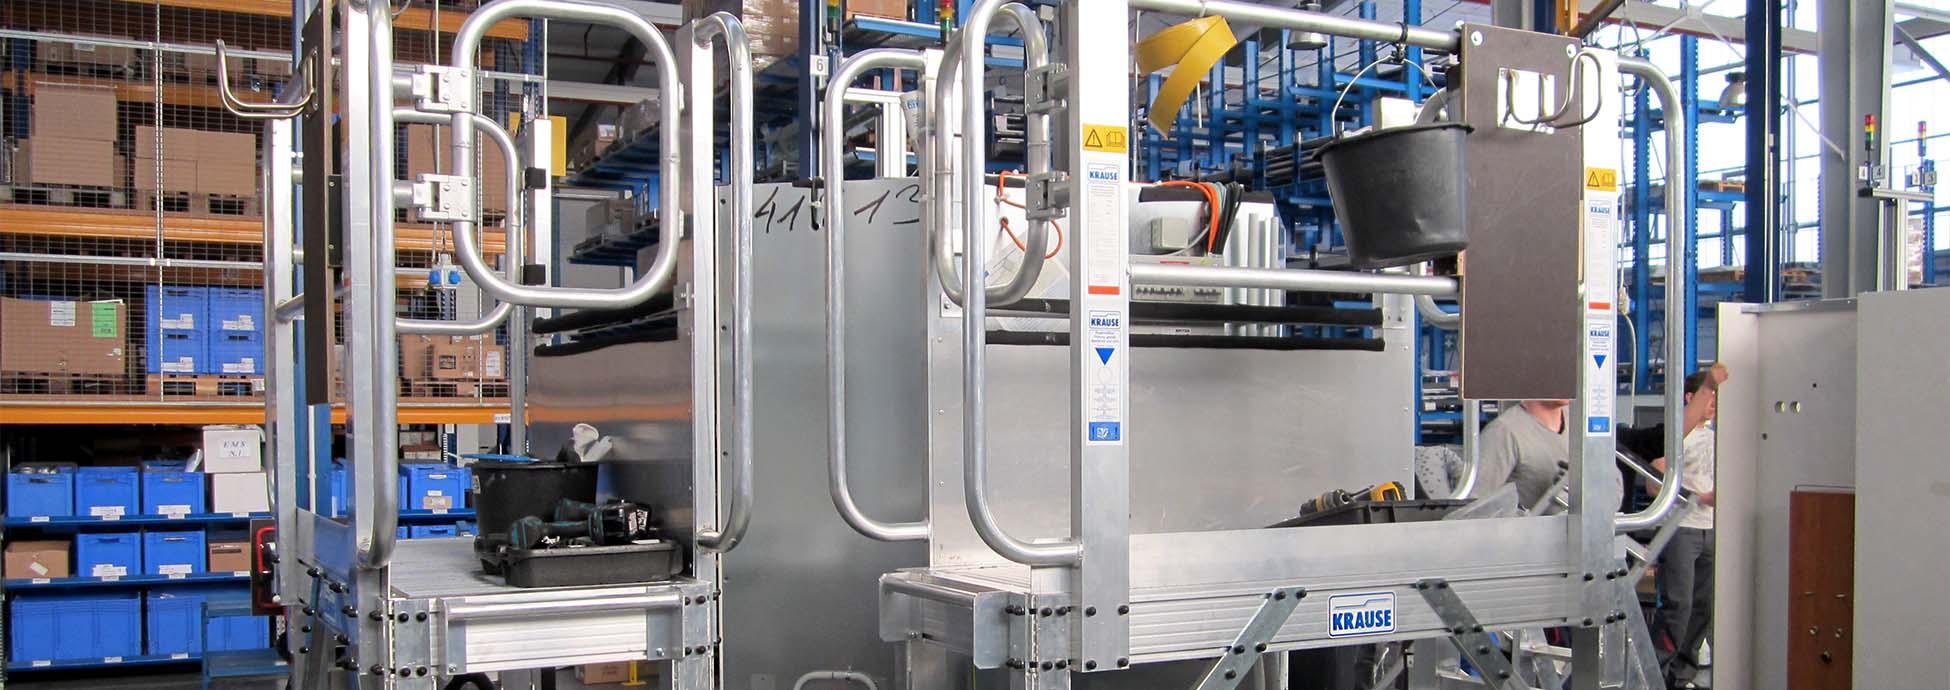 Höhenverstellbare mitfahrende Arbeitsplattform aus Aluminium